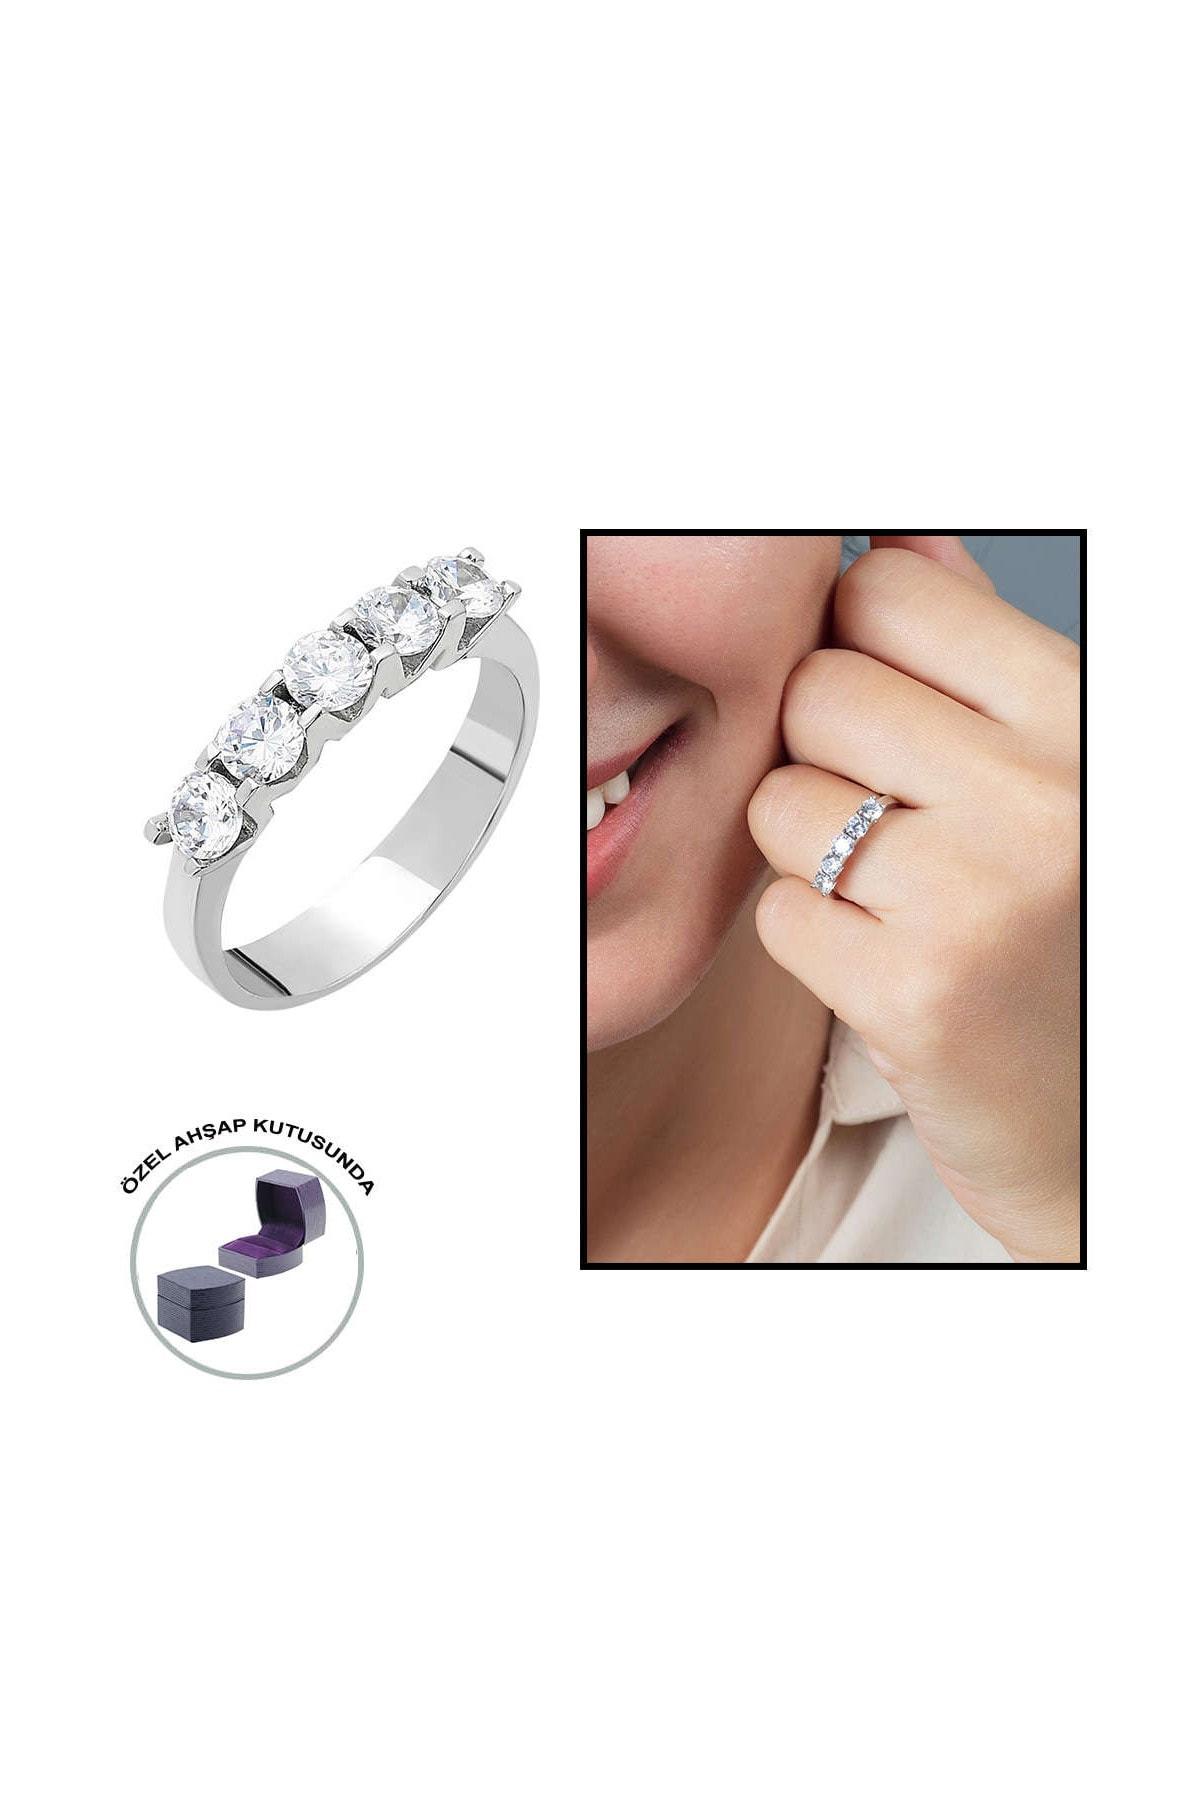 Tesbihane Starlight Diamond Pırlanta Montür Mini Tasarım 925 Ayar Gümüş Bayan Beştaş Yüzük 102001809